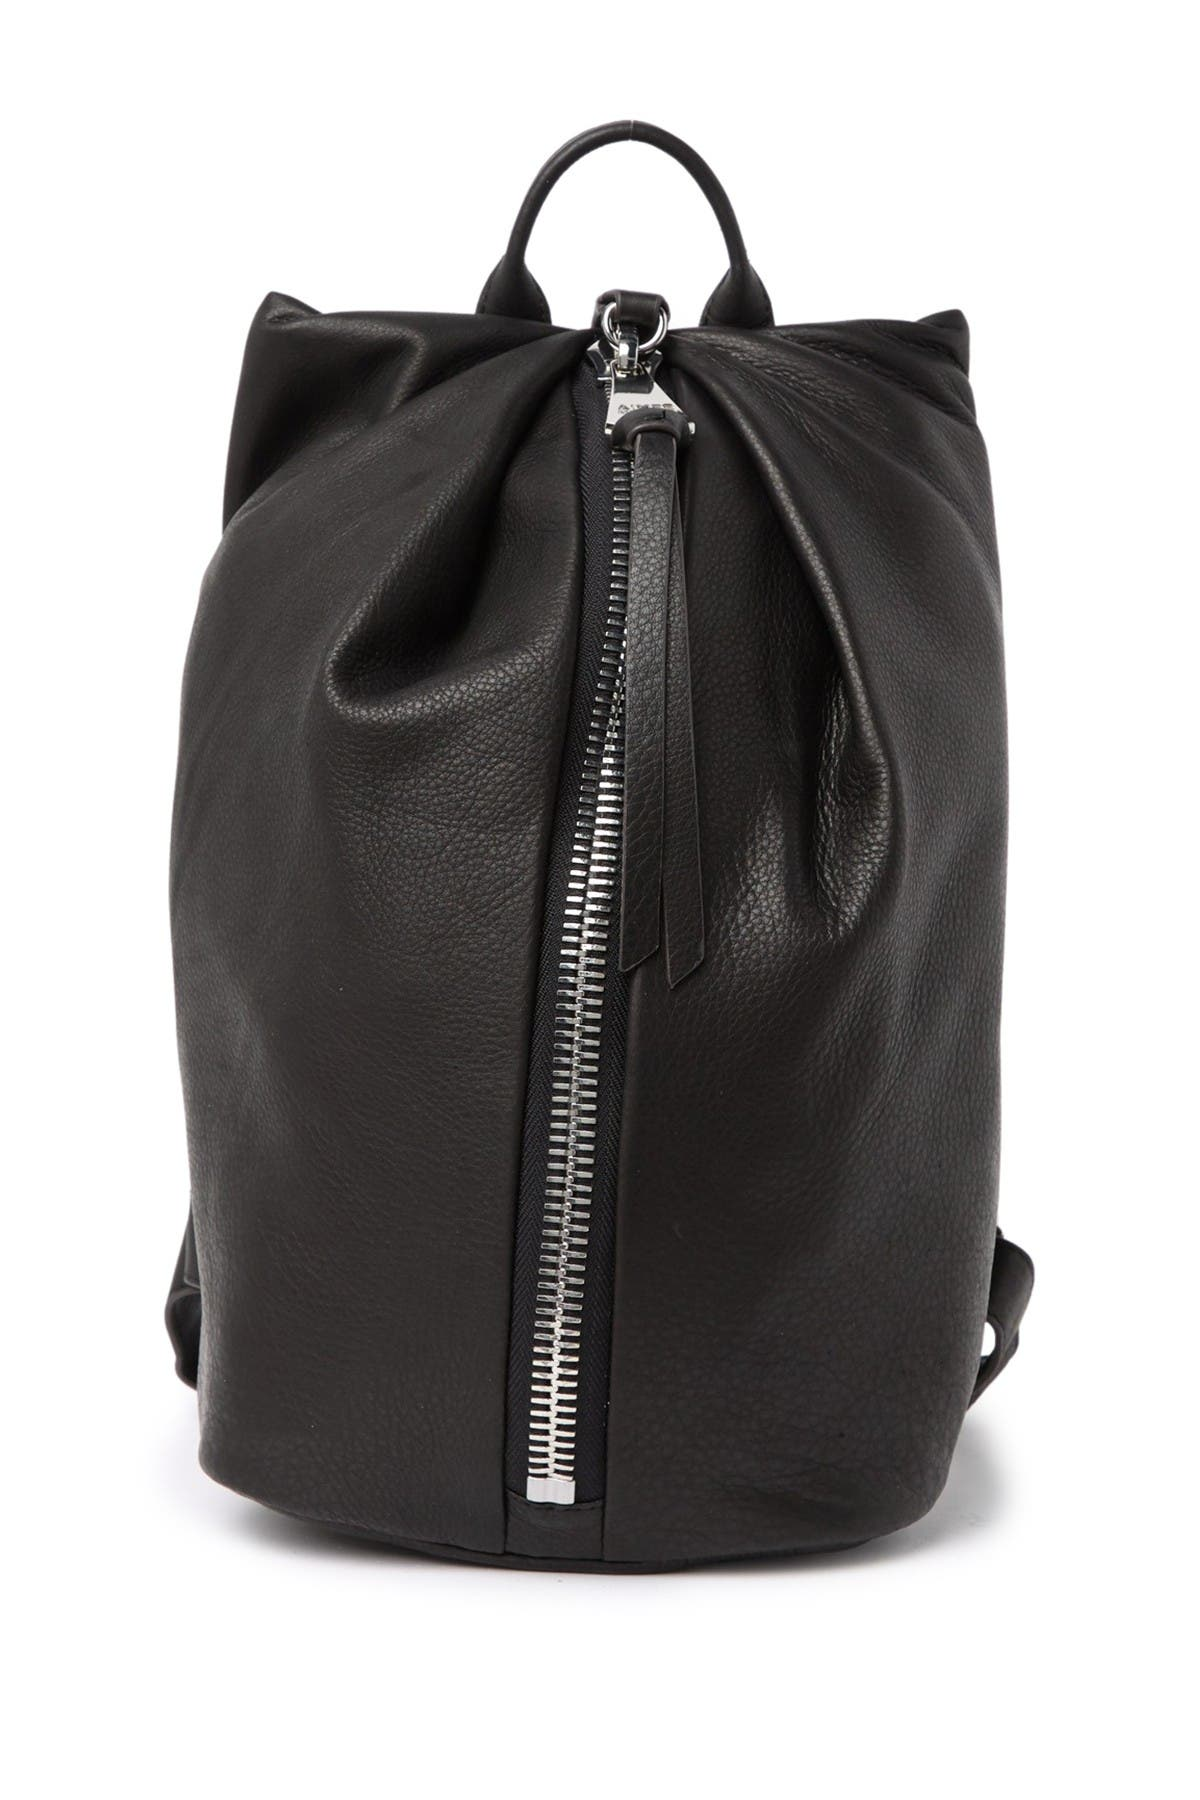 Image of Aimee Kestenberg Tamitha Leather Backpack